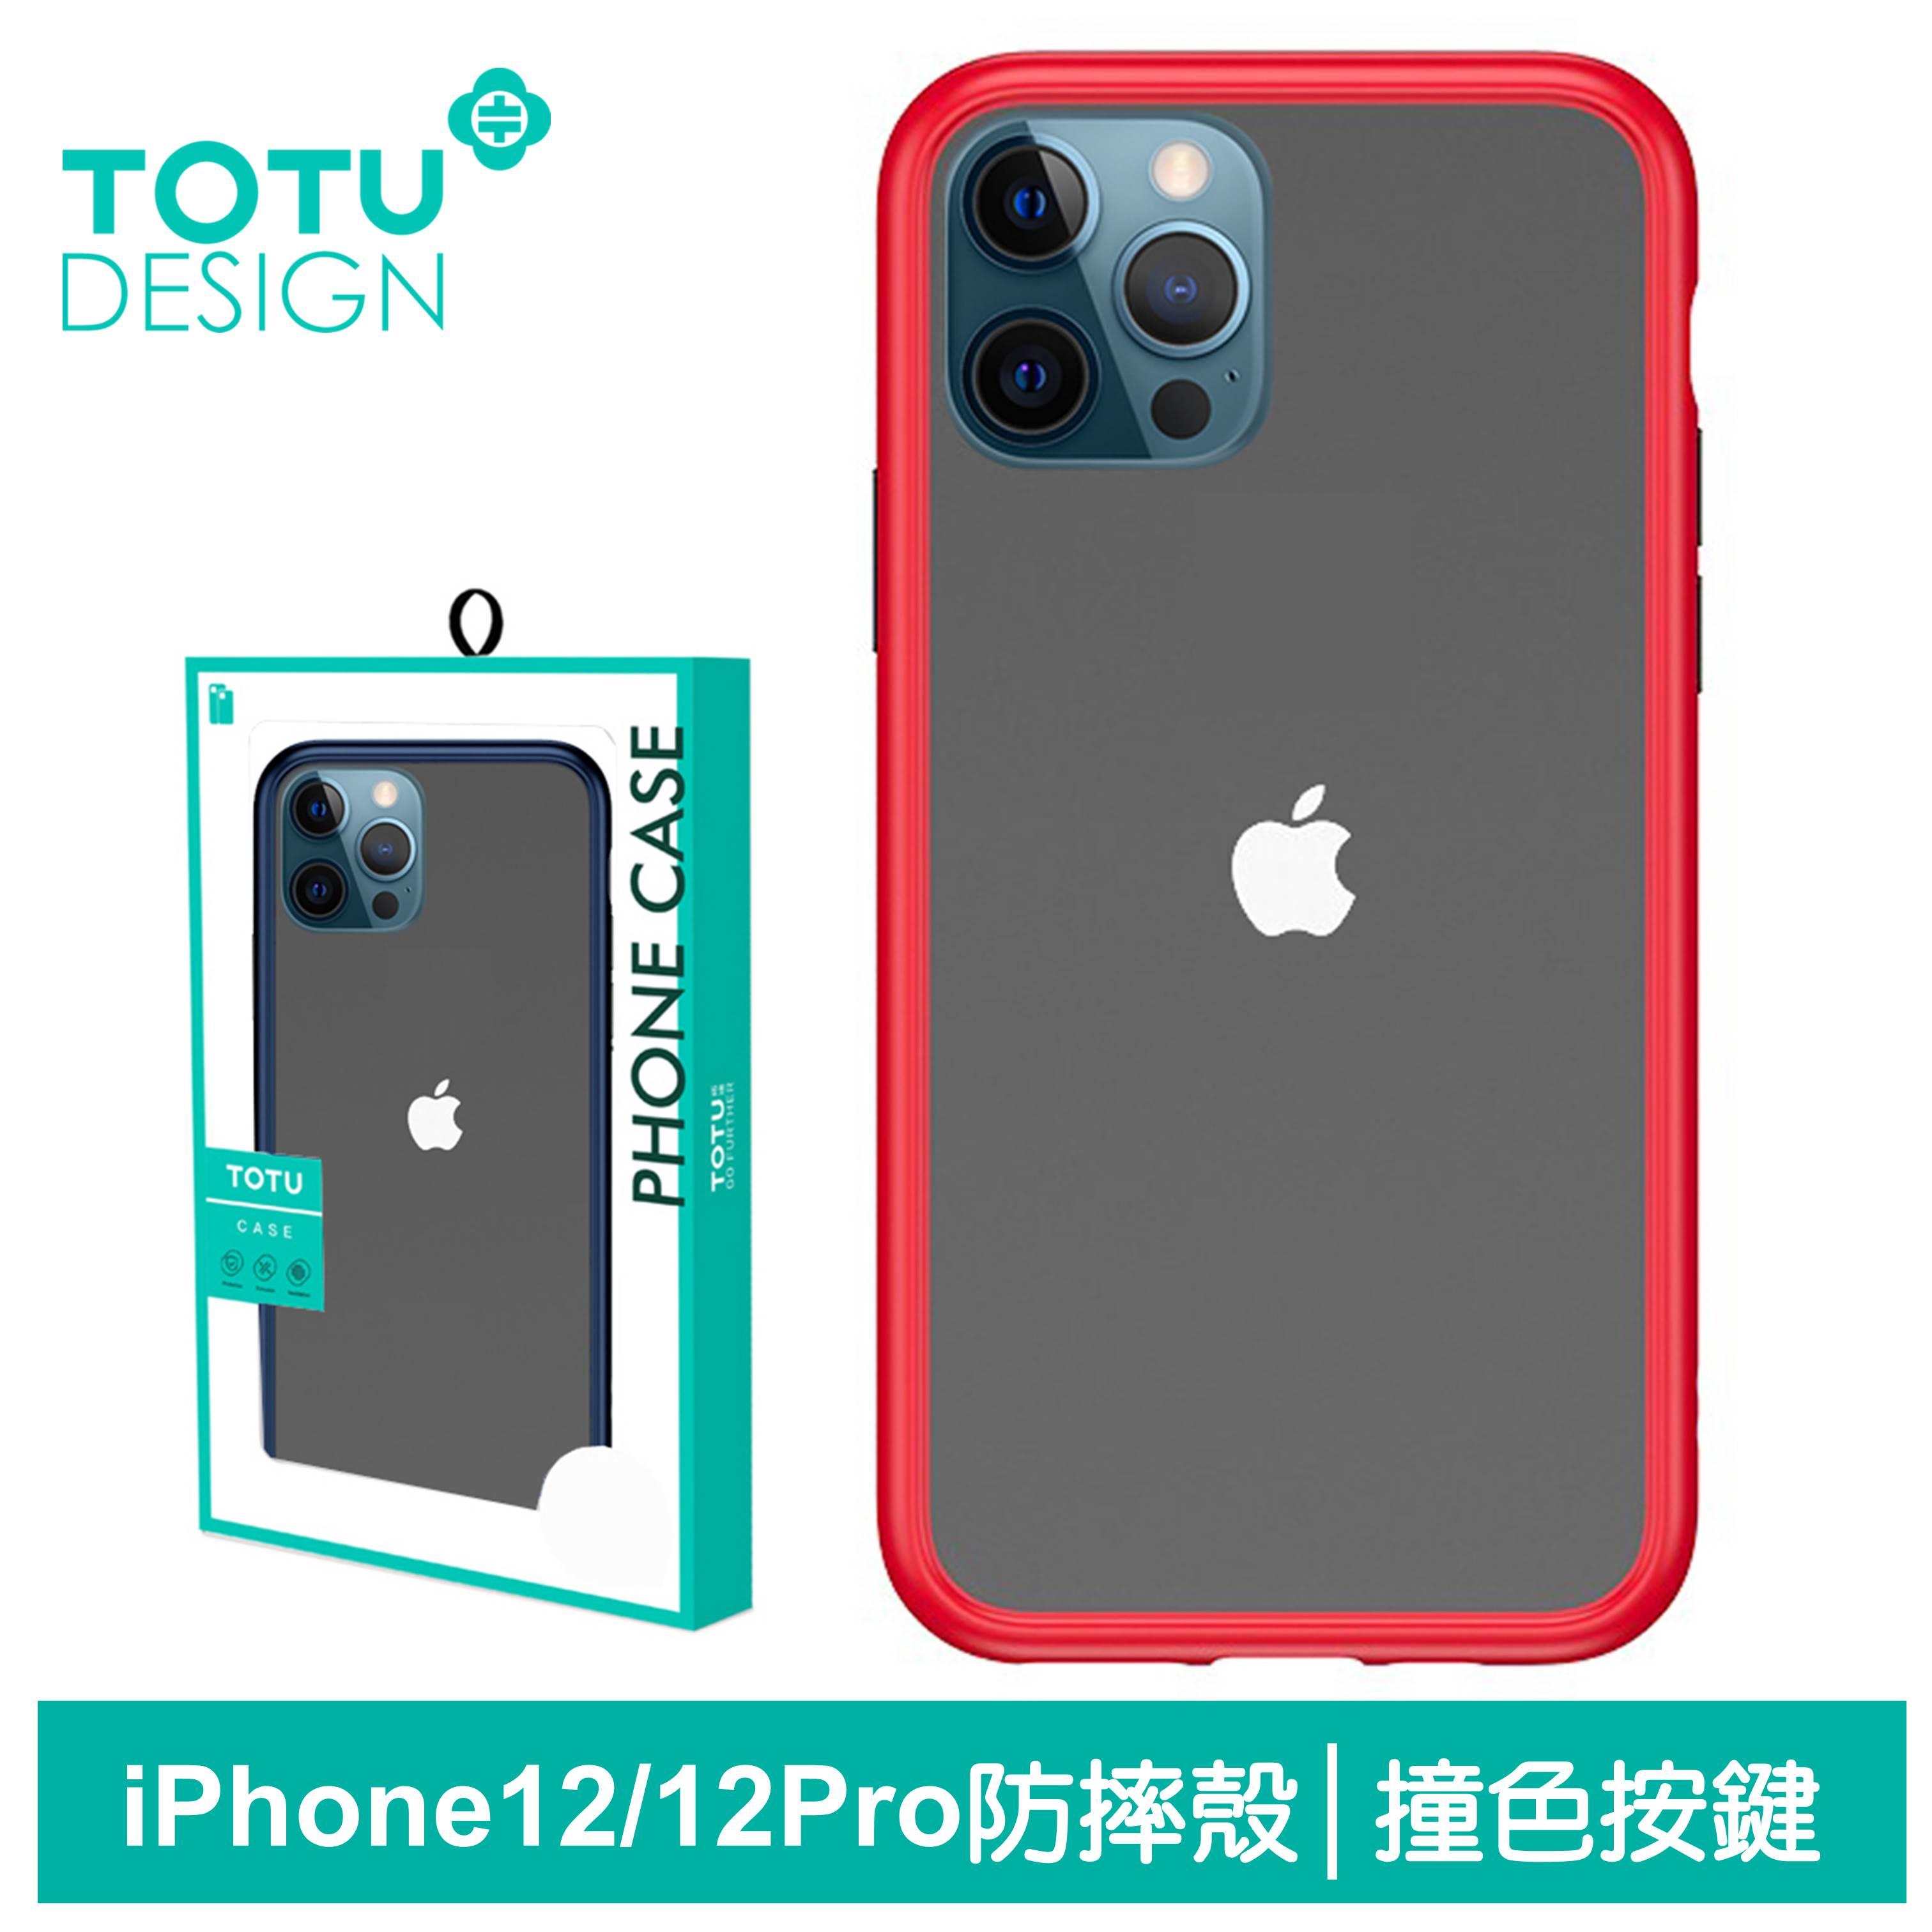 TOTU台灣官方 iPhone 12 / 12 Pro 手機殼 i12 Pro 保護殼 6.1吋 防摔殼 撞色按鍵 晶剛系列 紅色